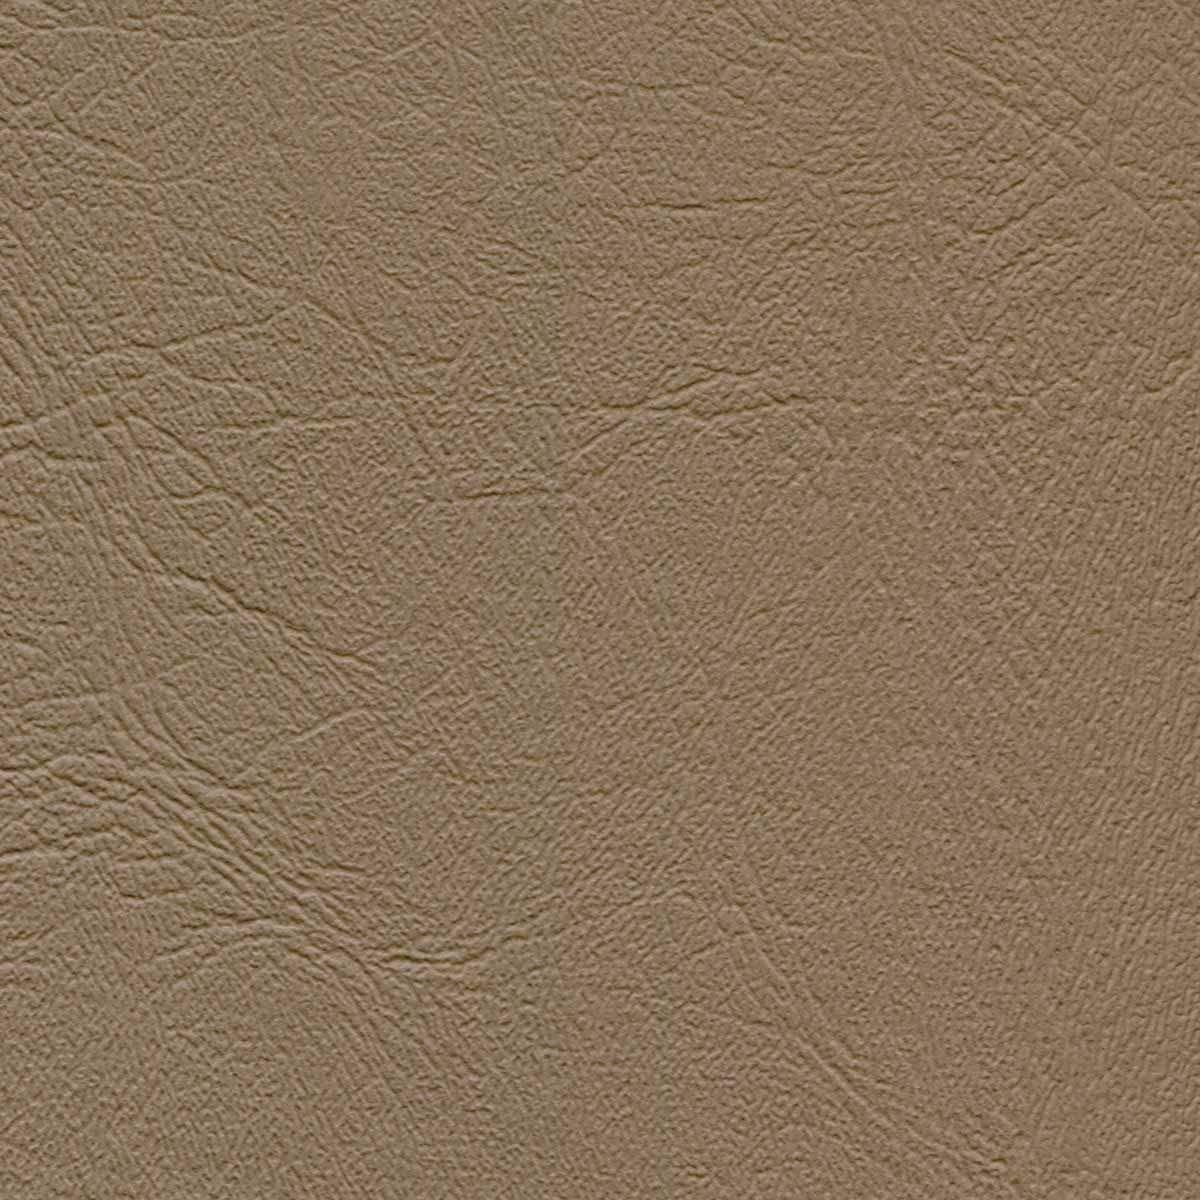 Vinyl Upholstery Fabric Medium Parchment Tan 54